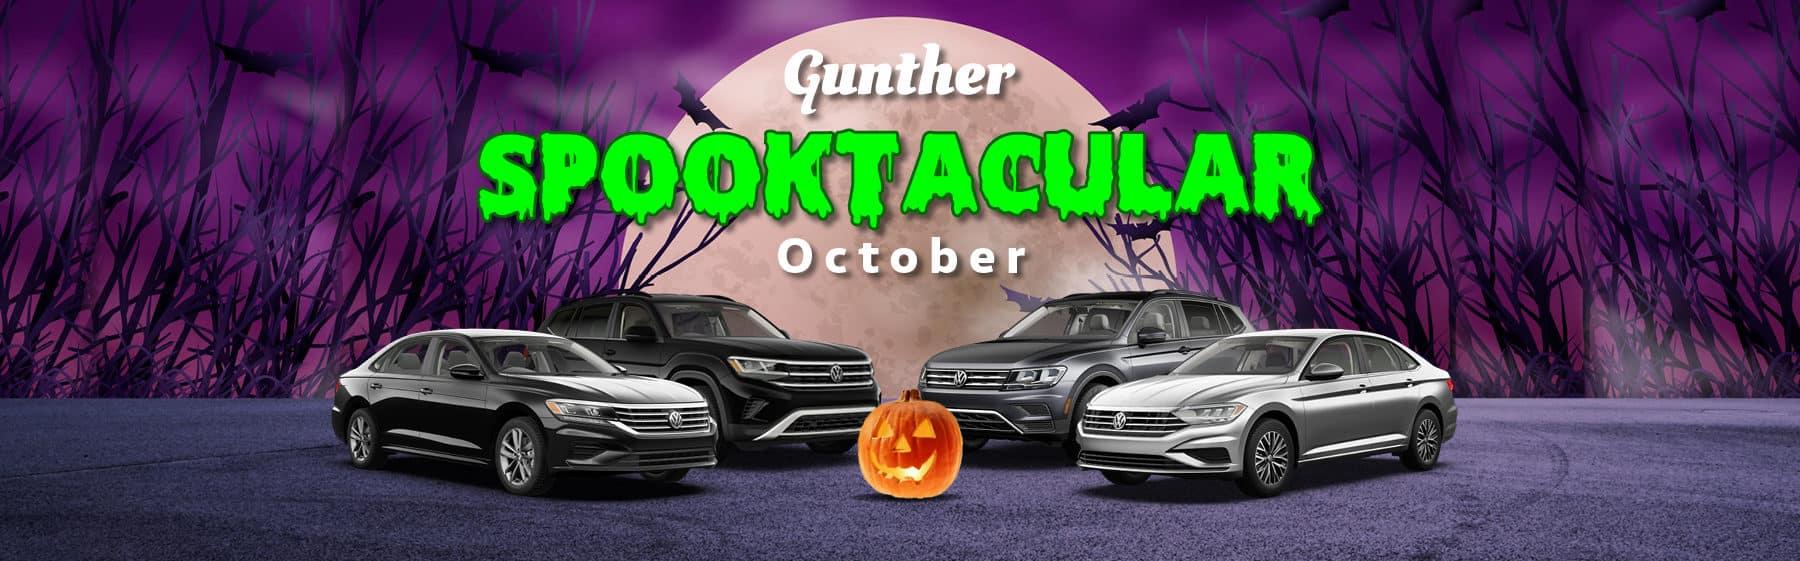 Gunther Spooktacular October.